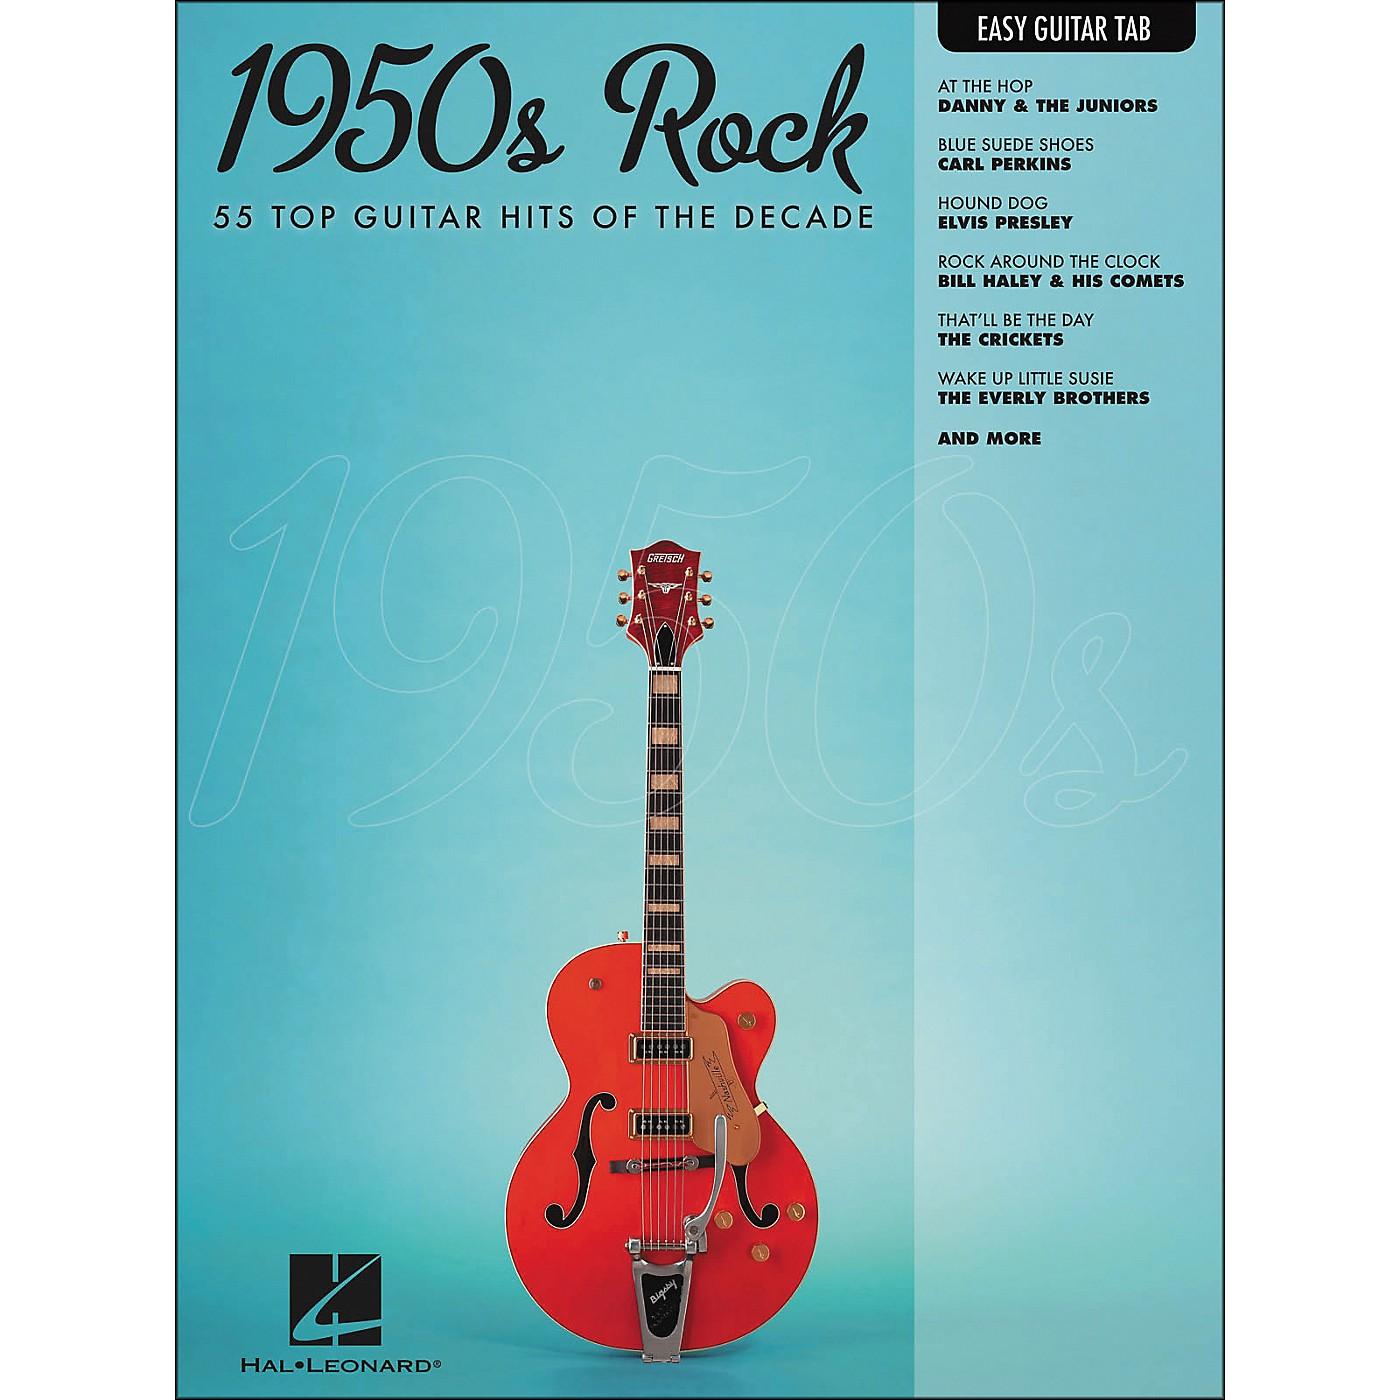 Hal Leonard 1950s Rock Easy Guitar Tab thumbnail